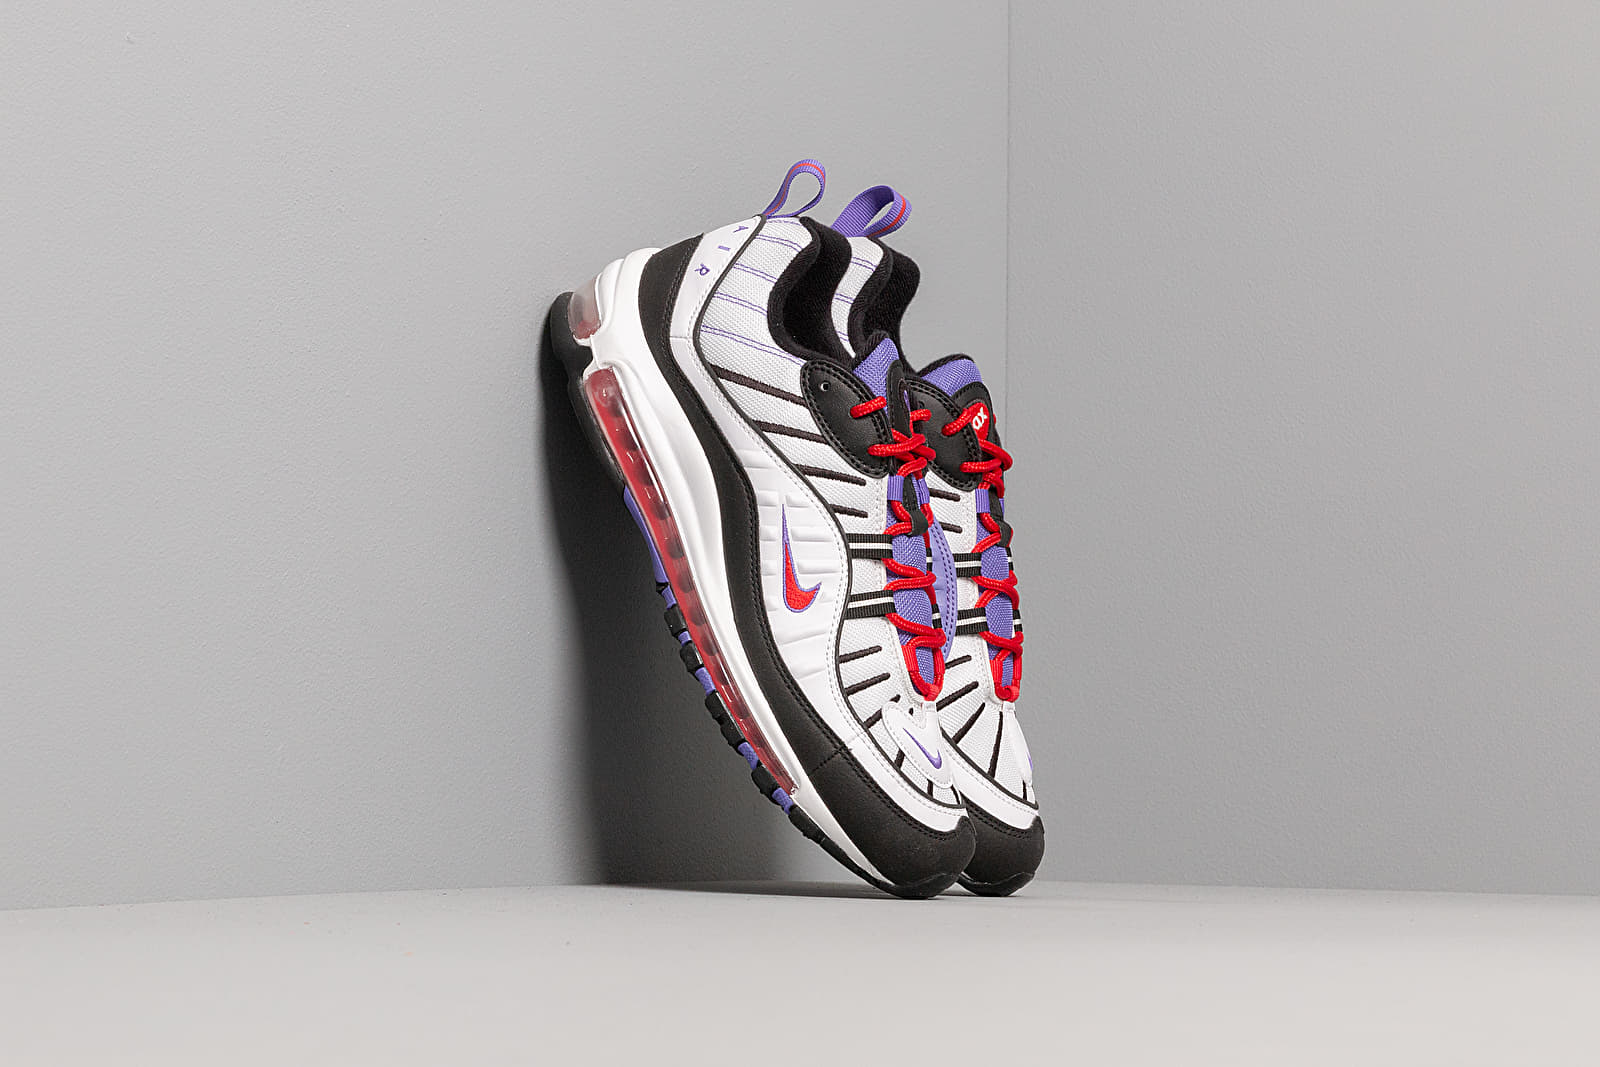 Nike Air Max 98 White Black Psychic Purple | Footshop